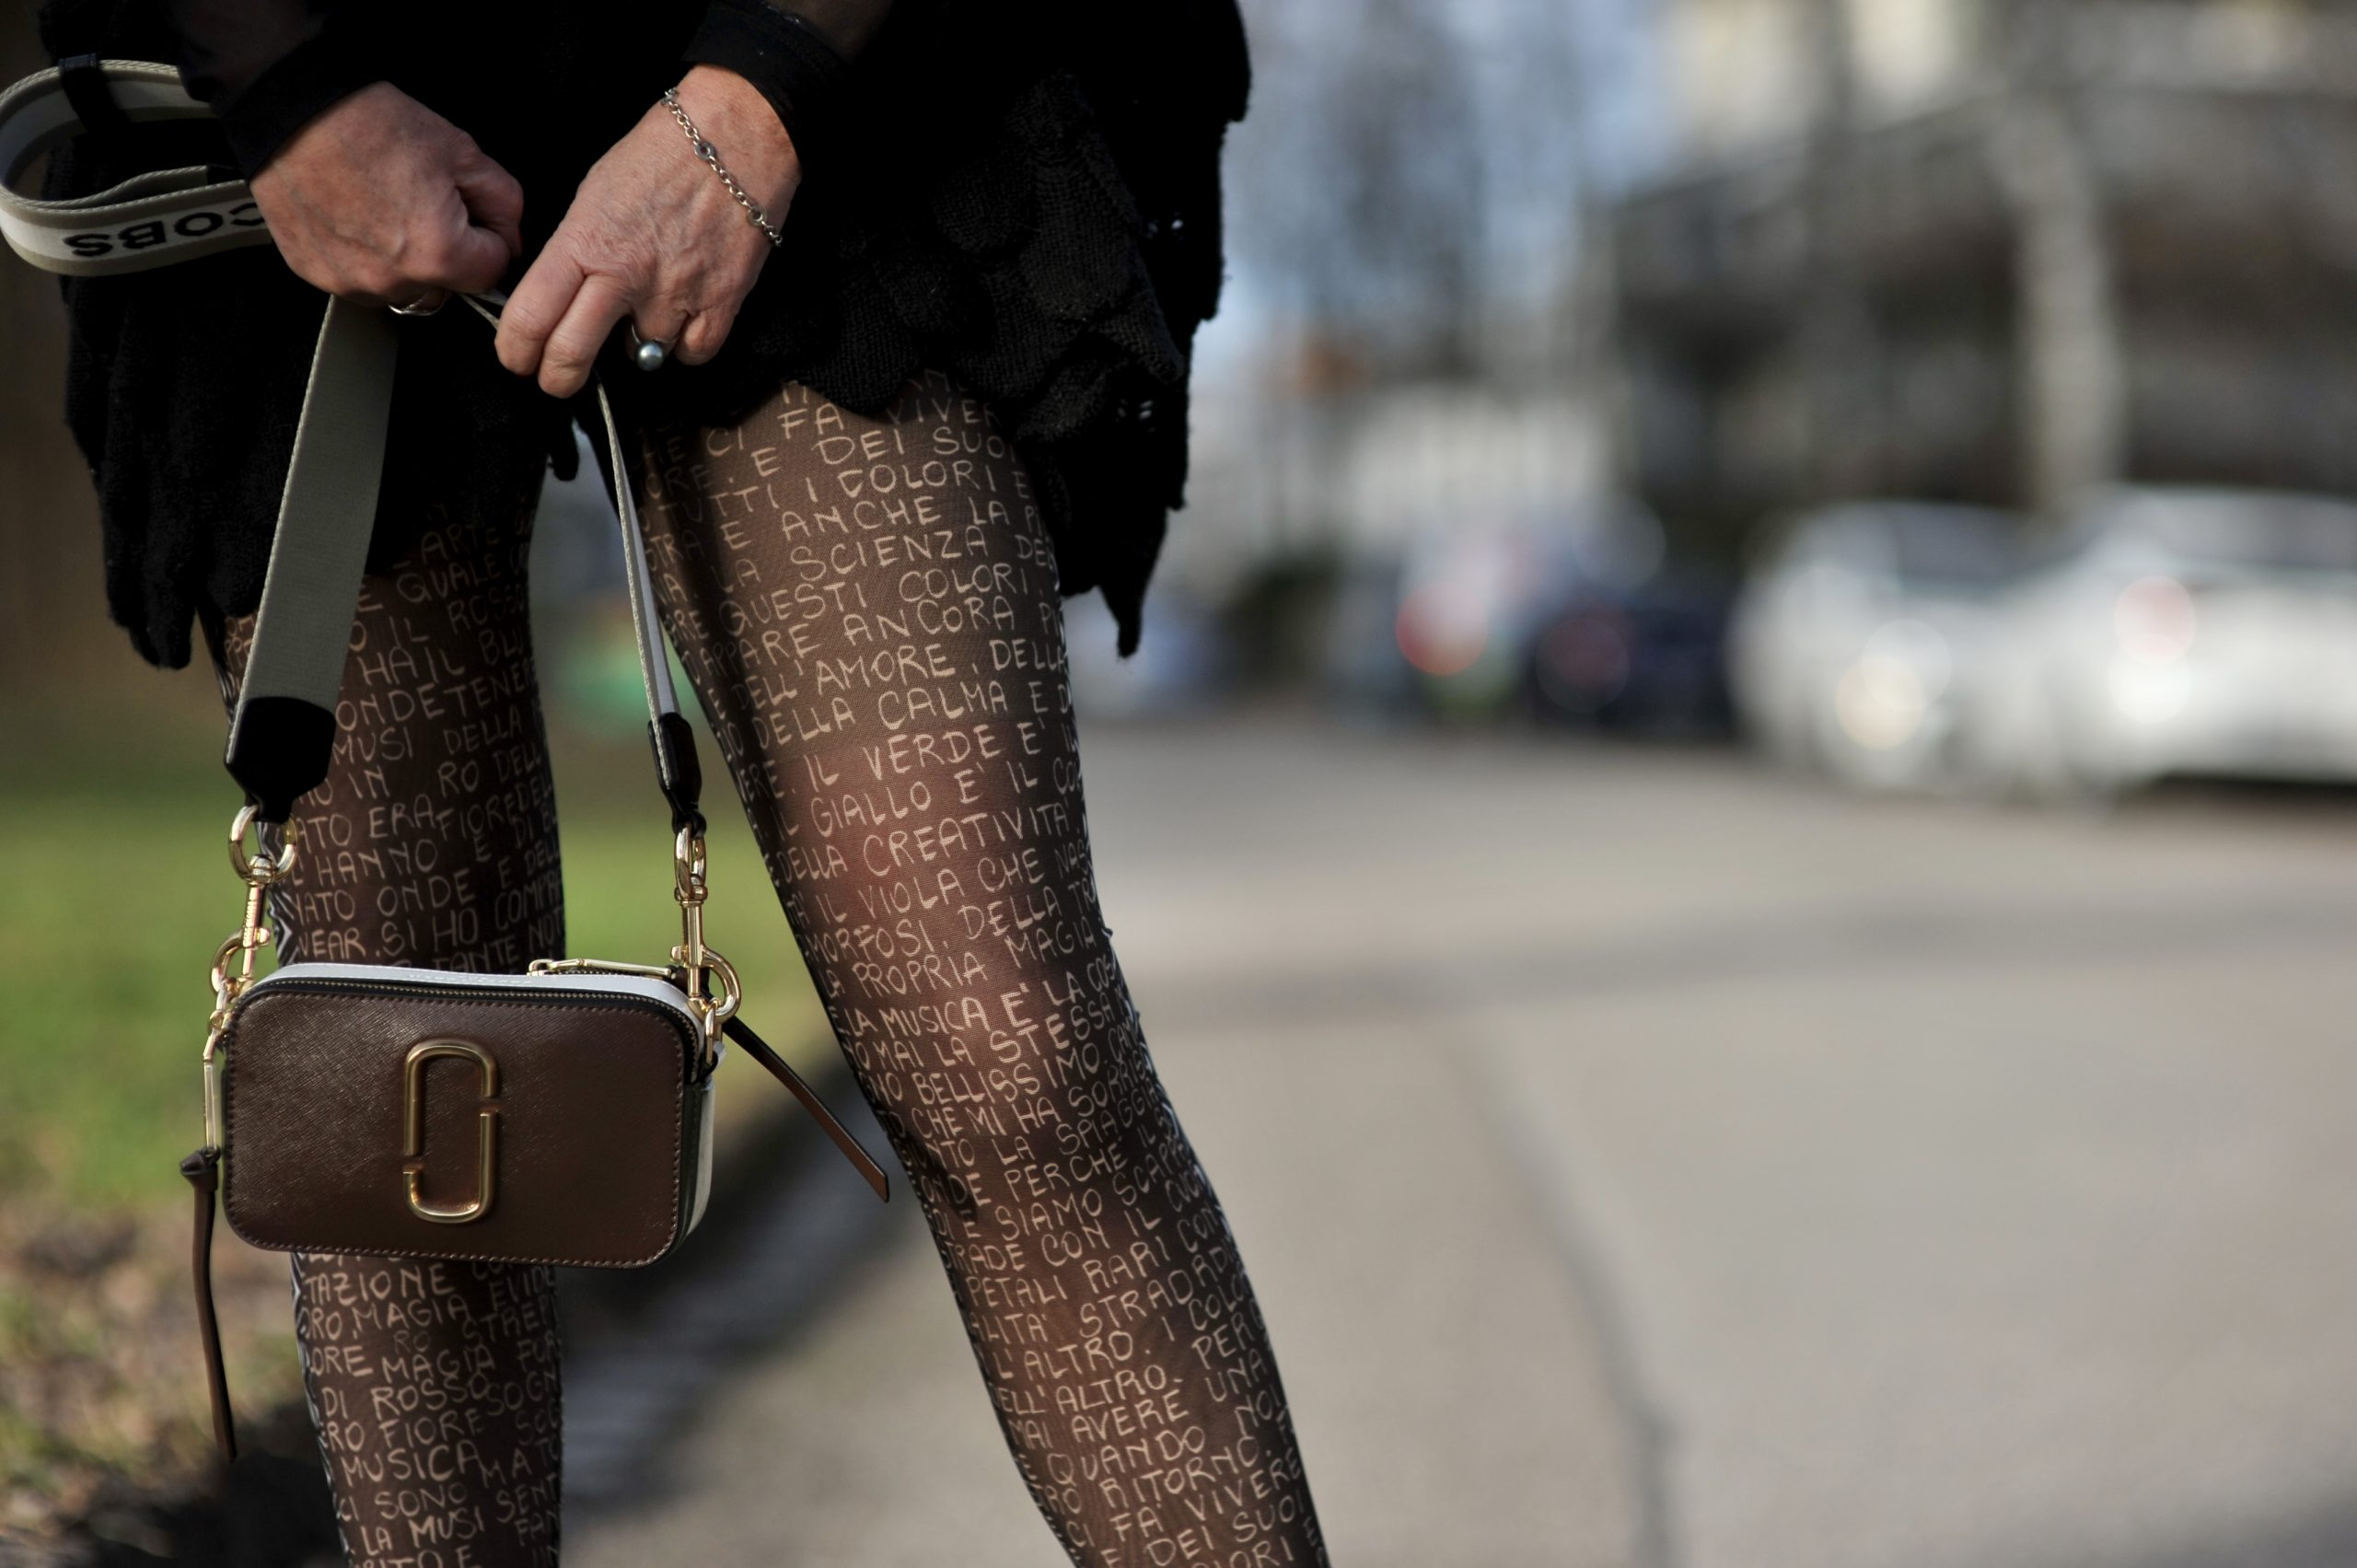 RO Skin, RO Skin special, mystyle, ageless fashion, ageless style, ageless, over50, timeless, tattoo, italia moda, italian fashion, fashionweek, stylish, fashionblogger, eyewearblogger, streetstyle, cochastyle, Fashionblog Augsburg